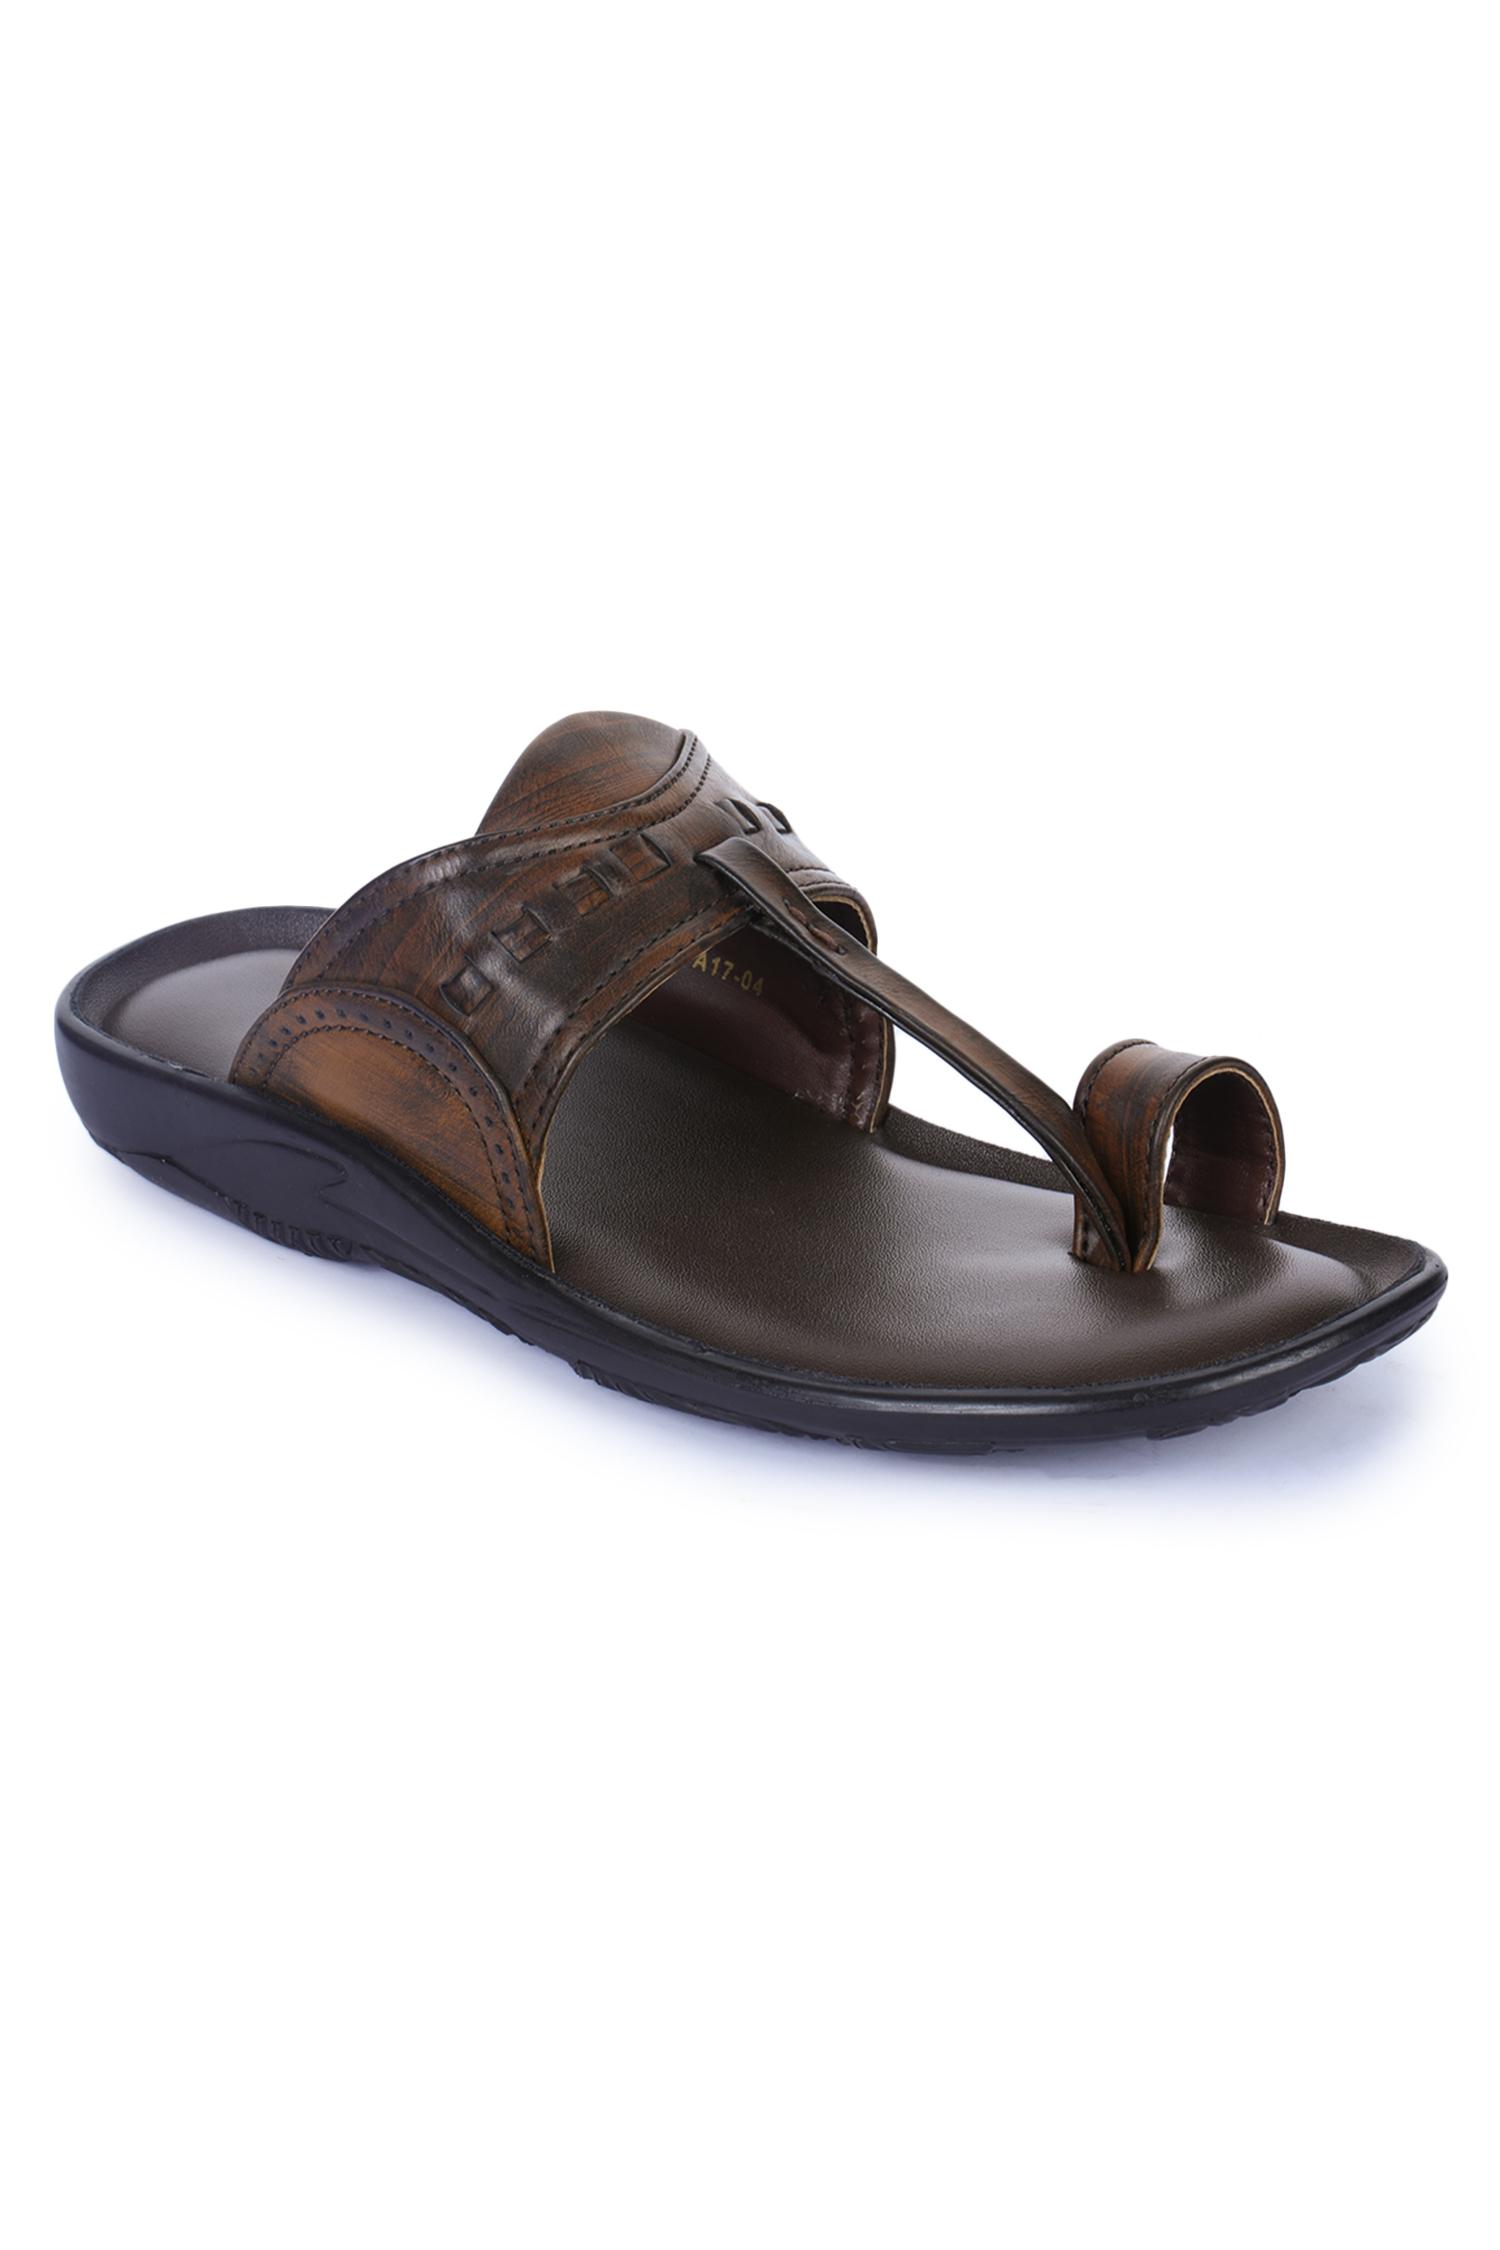 Liberty | Liberty Coolers Brown Flip Flops A17-04_Brown_1 For - Men